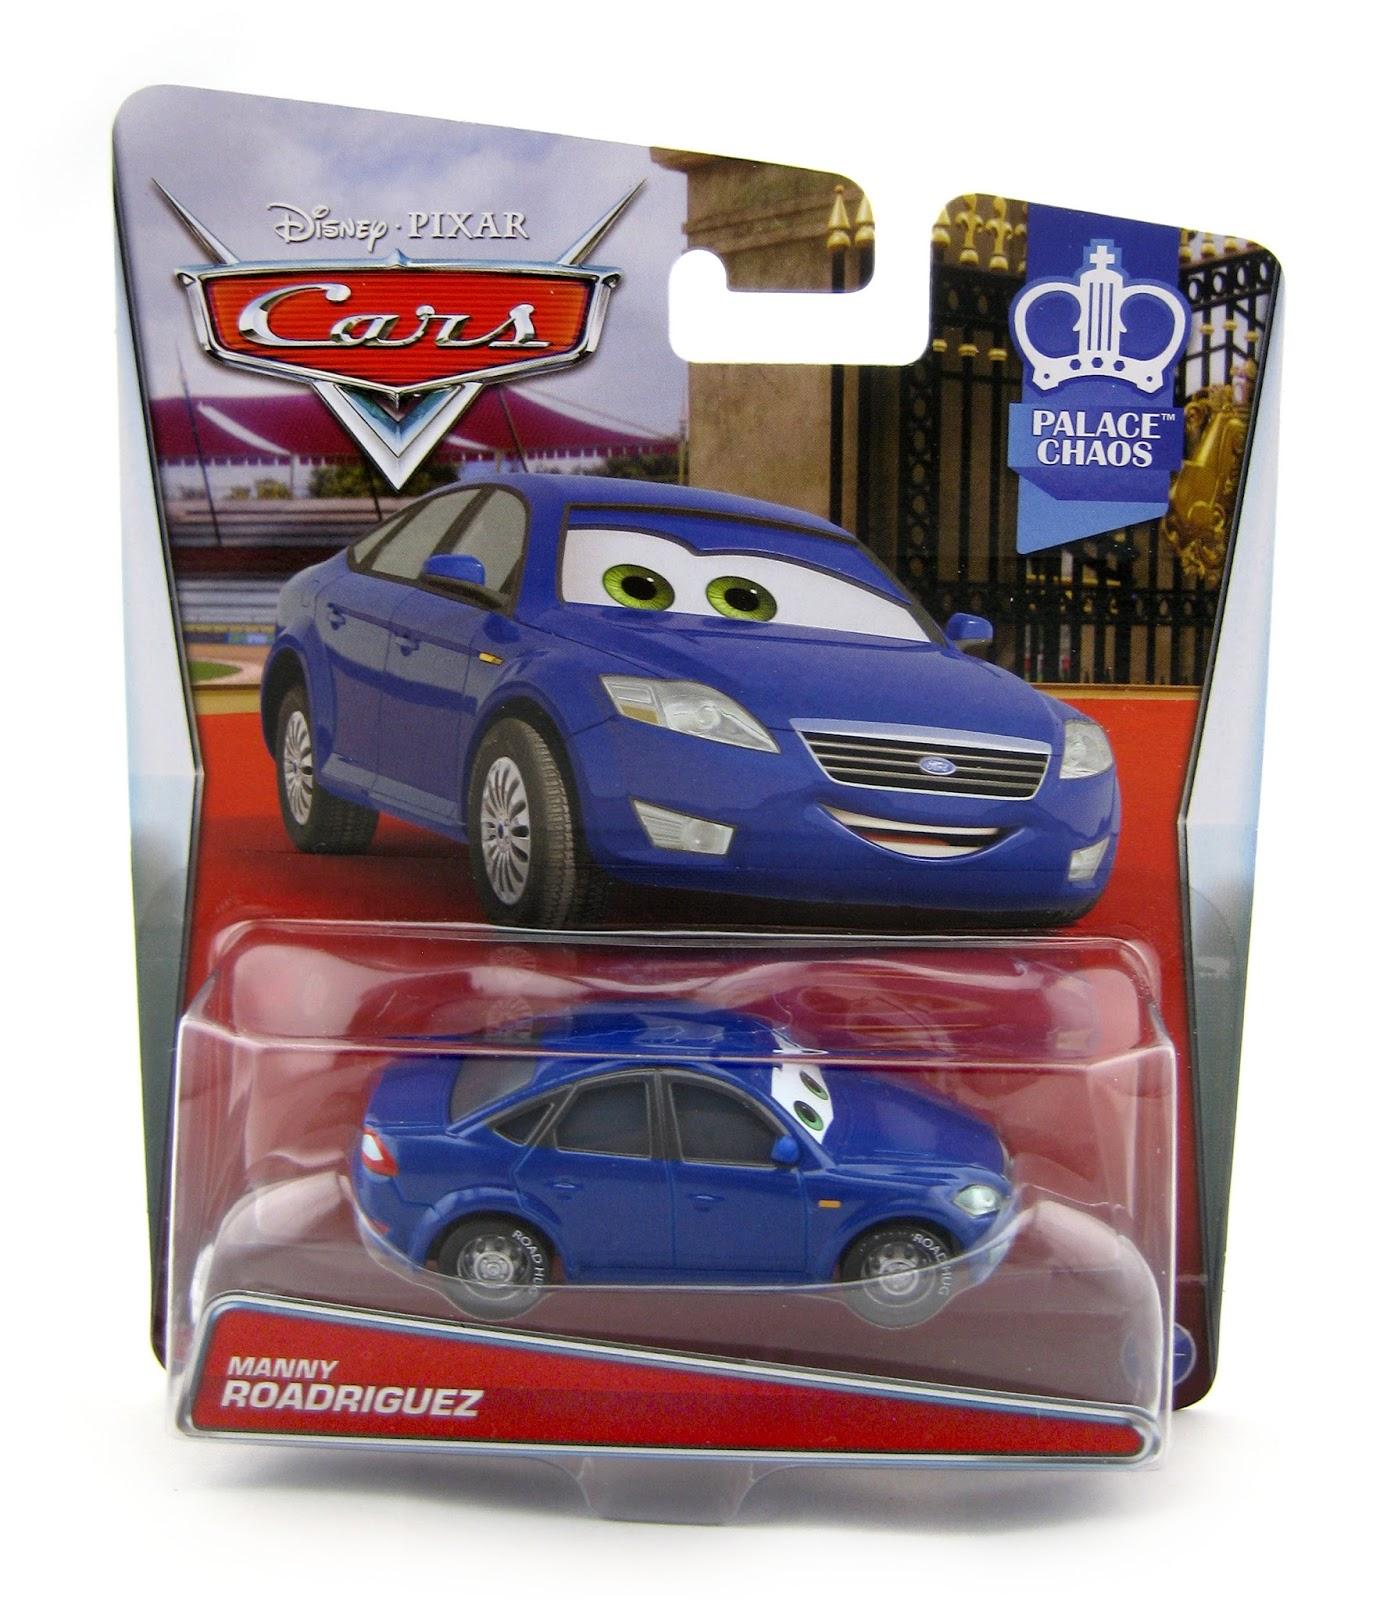 Dan The Pixar Fan: Cars 2: Manny Roadriguez